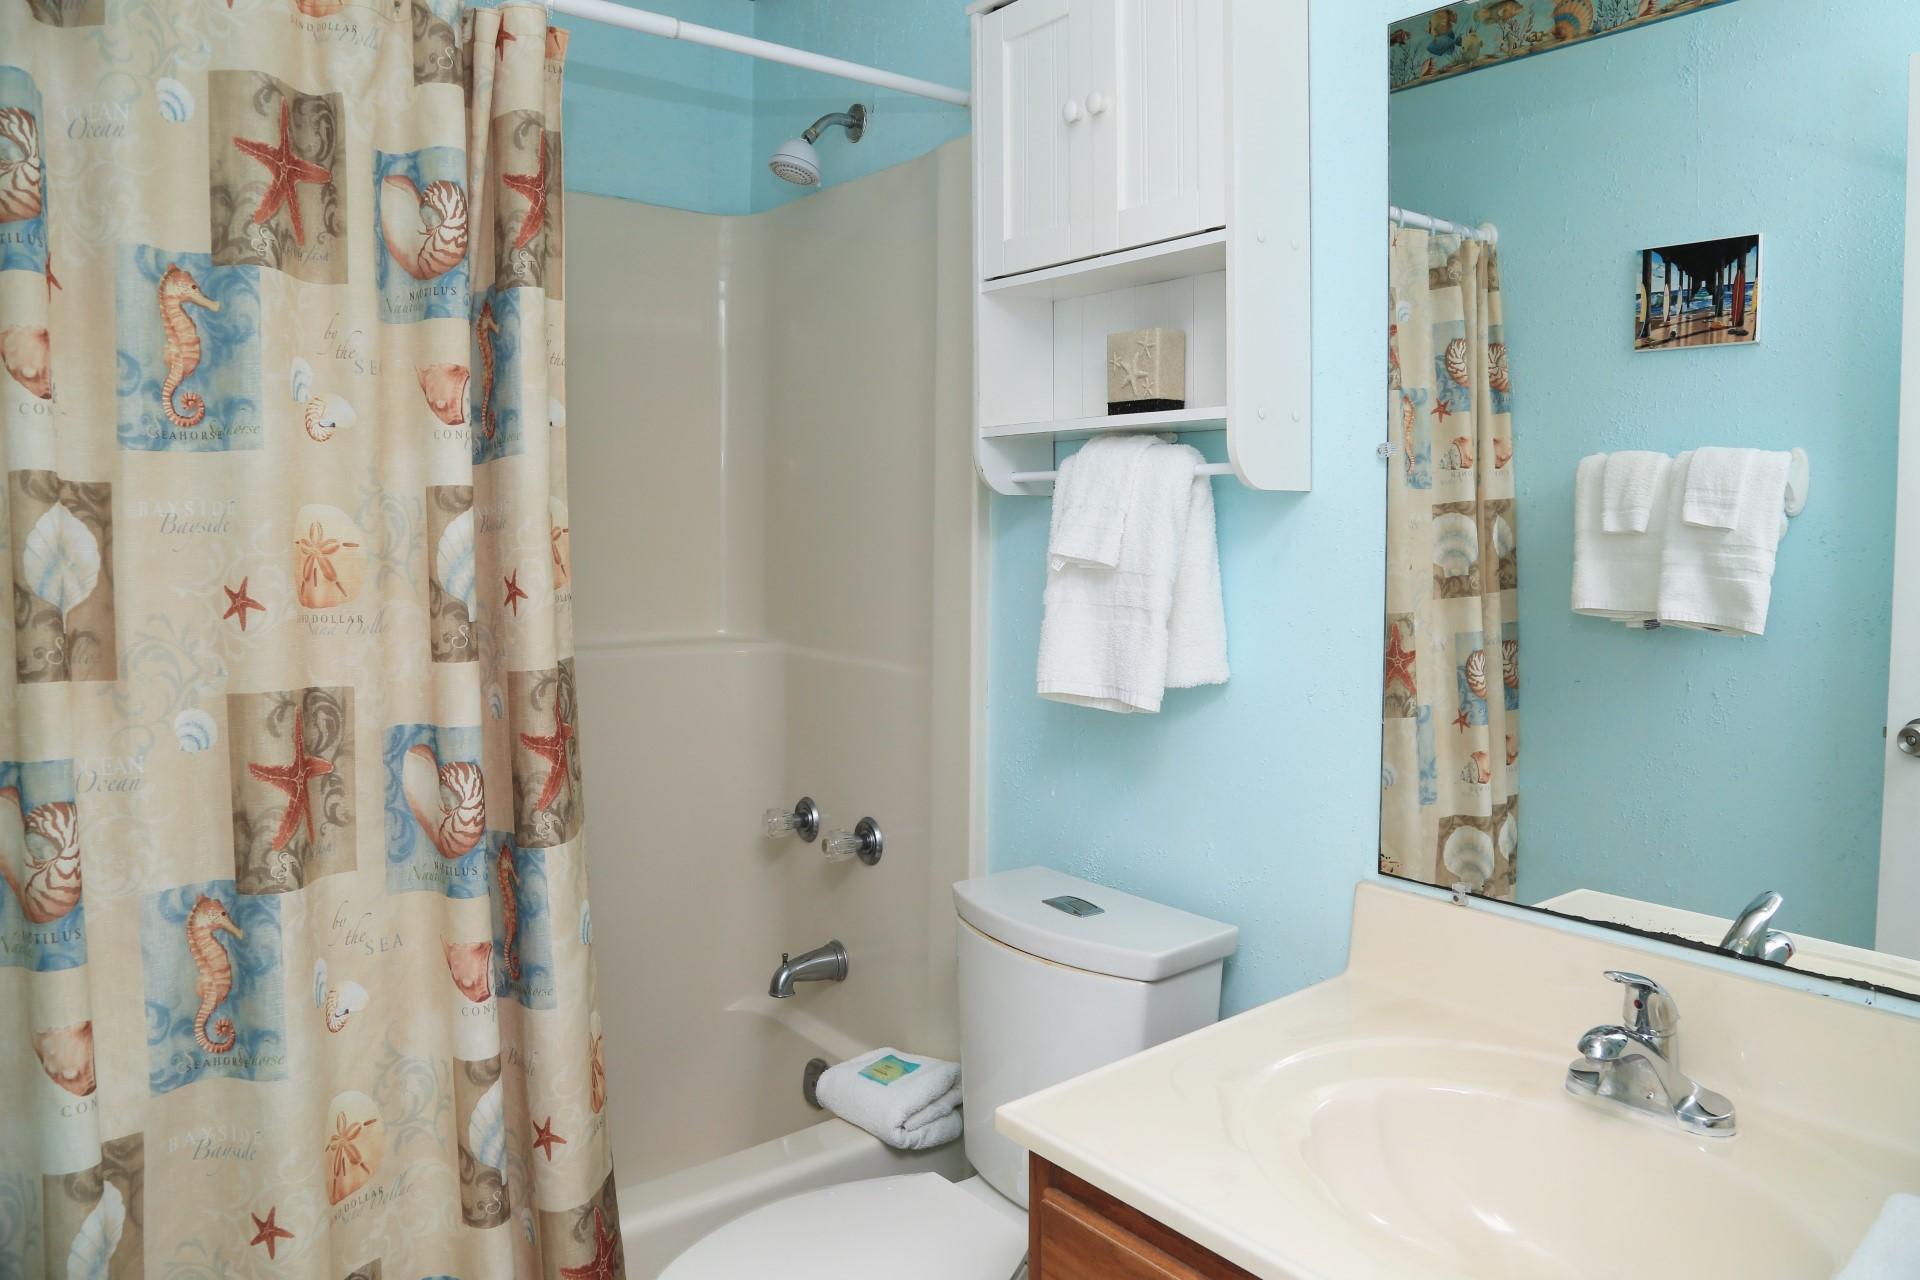 Hallway bathroom - shower/tub combo and comfort height toile